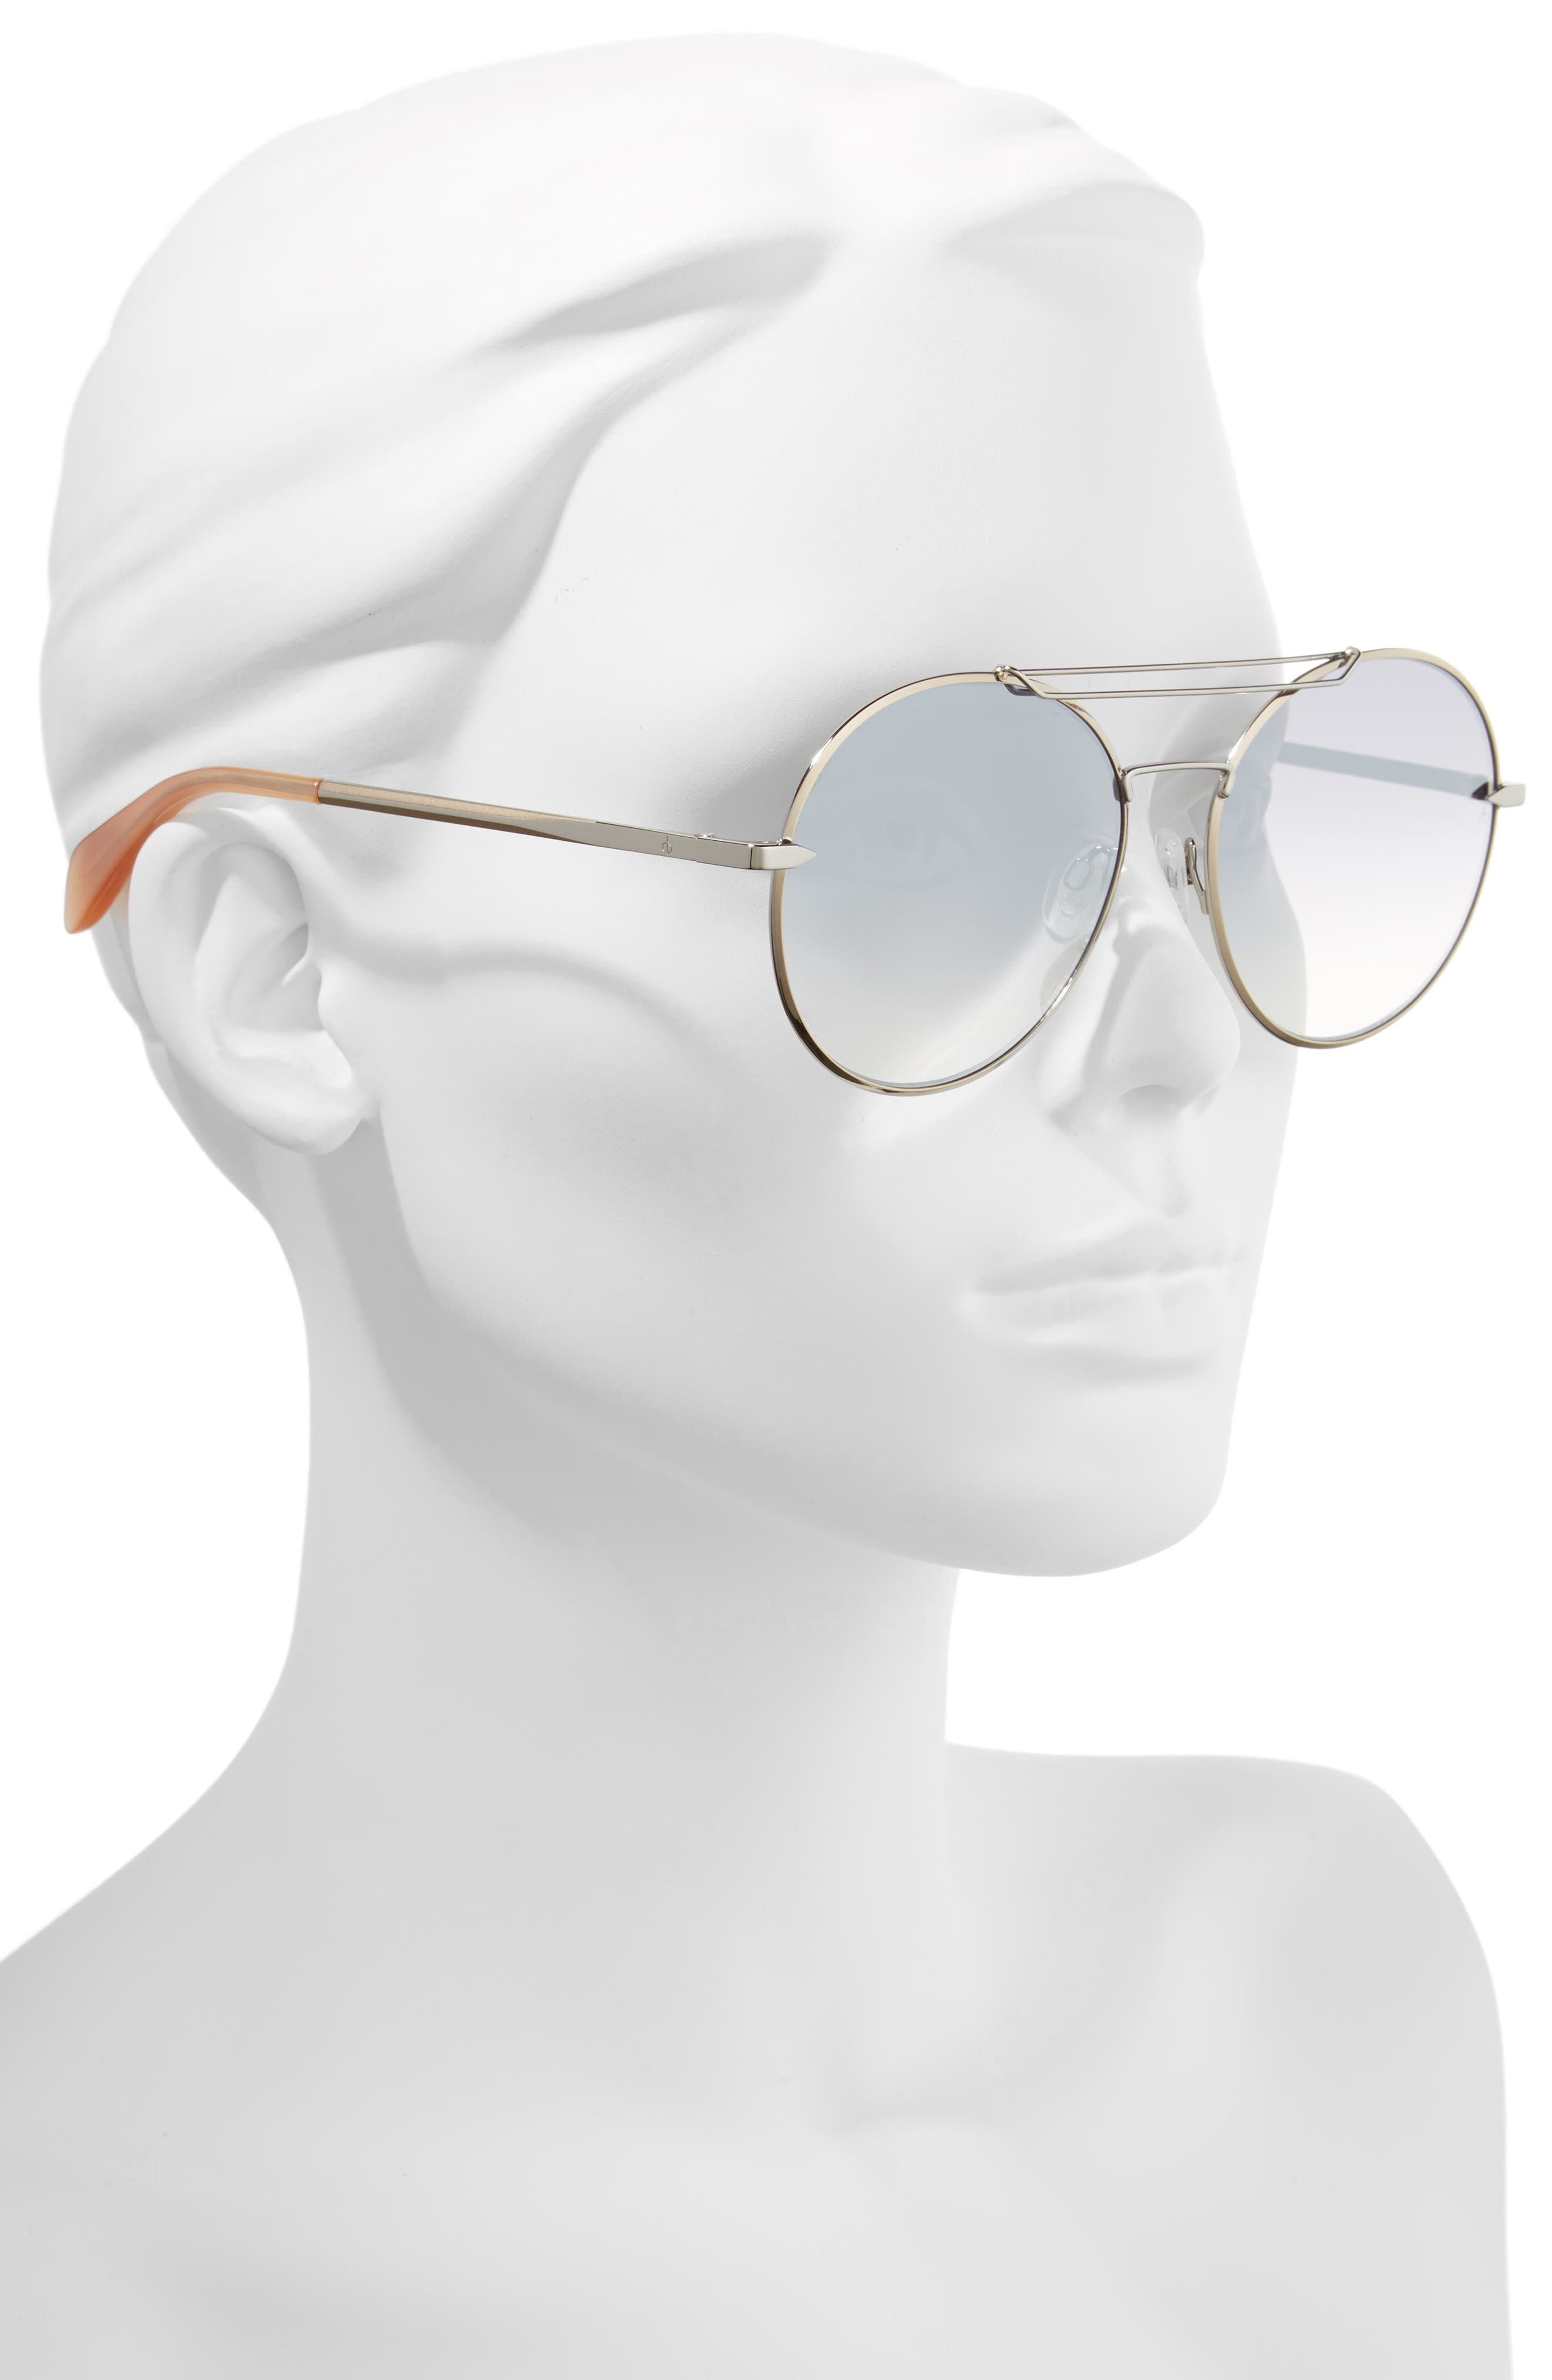 59mm Round Metal Aviator Sunglasses,                             Alternate thumbnail 2, color,                             RUTHENIUM